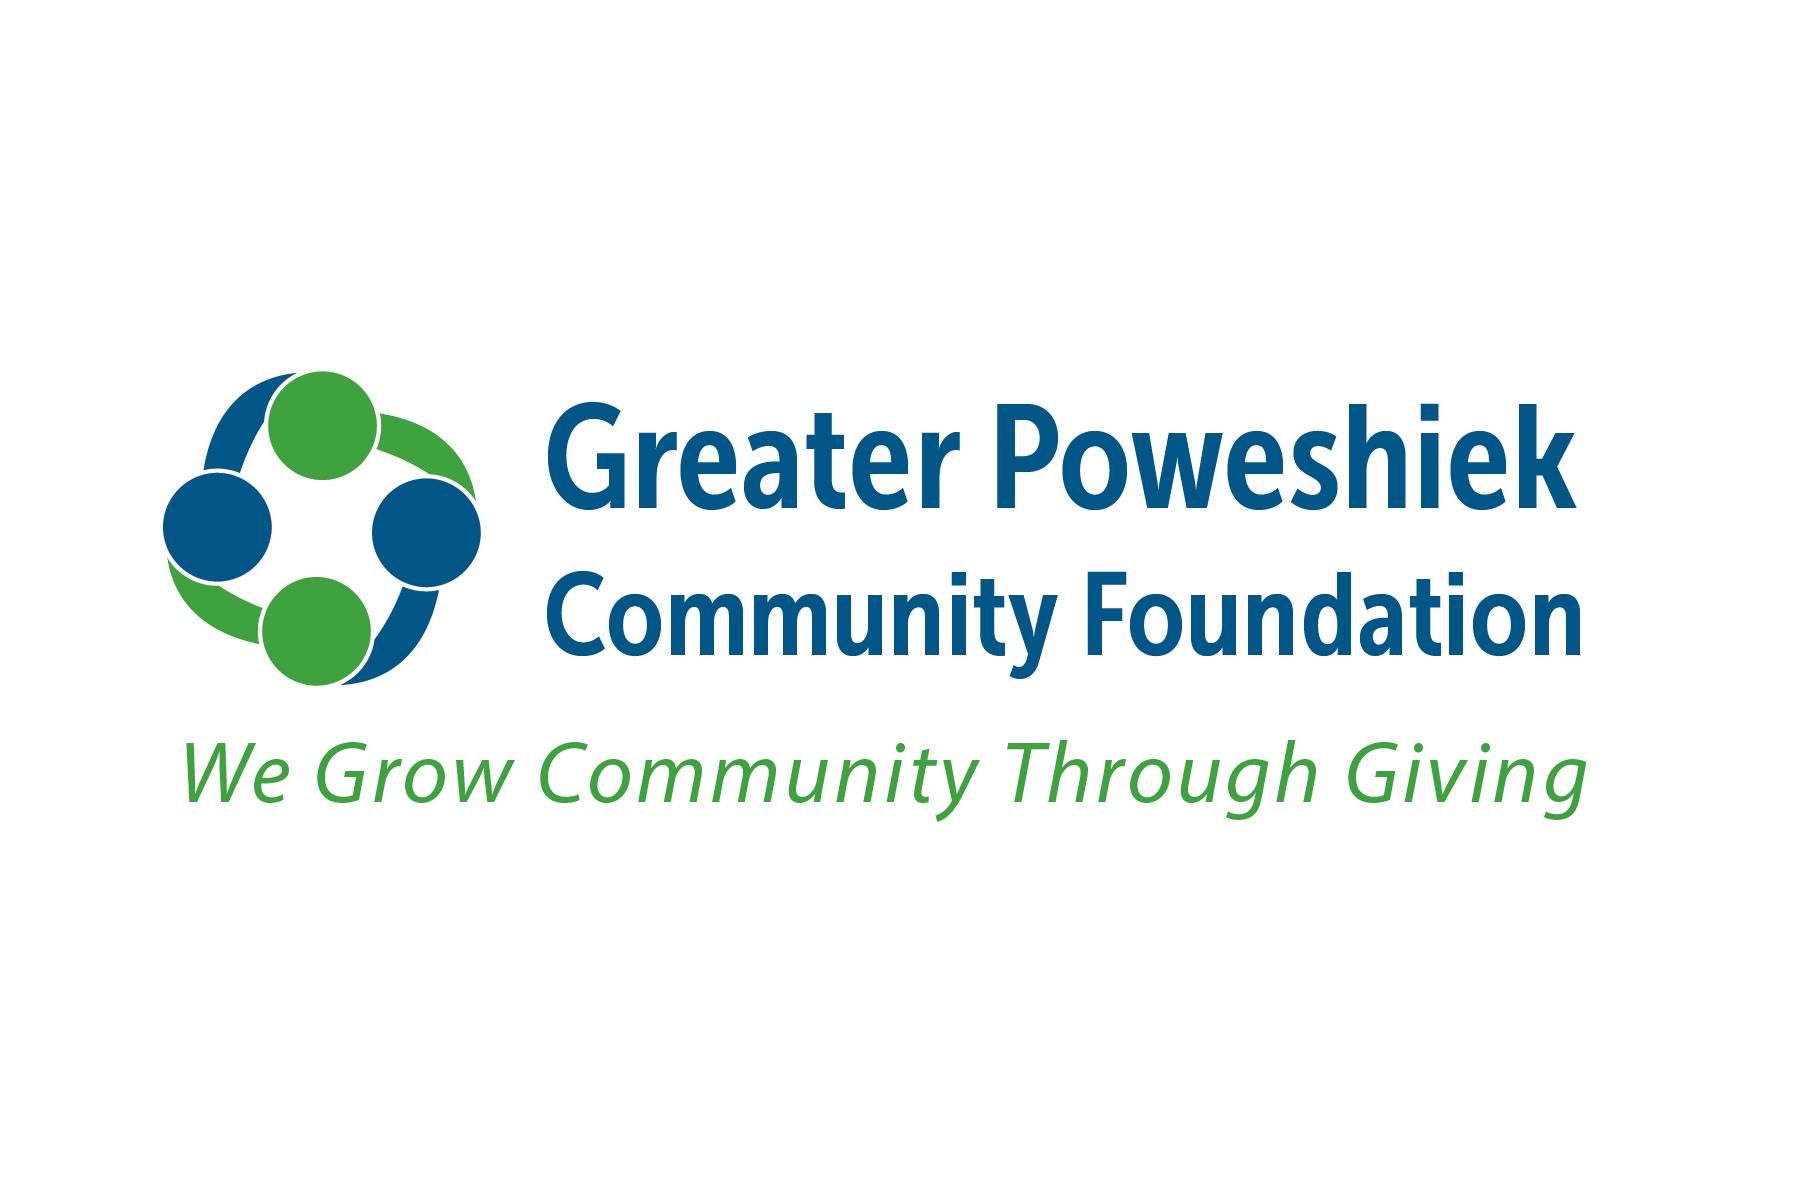 greater poweshiek community foundation logo